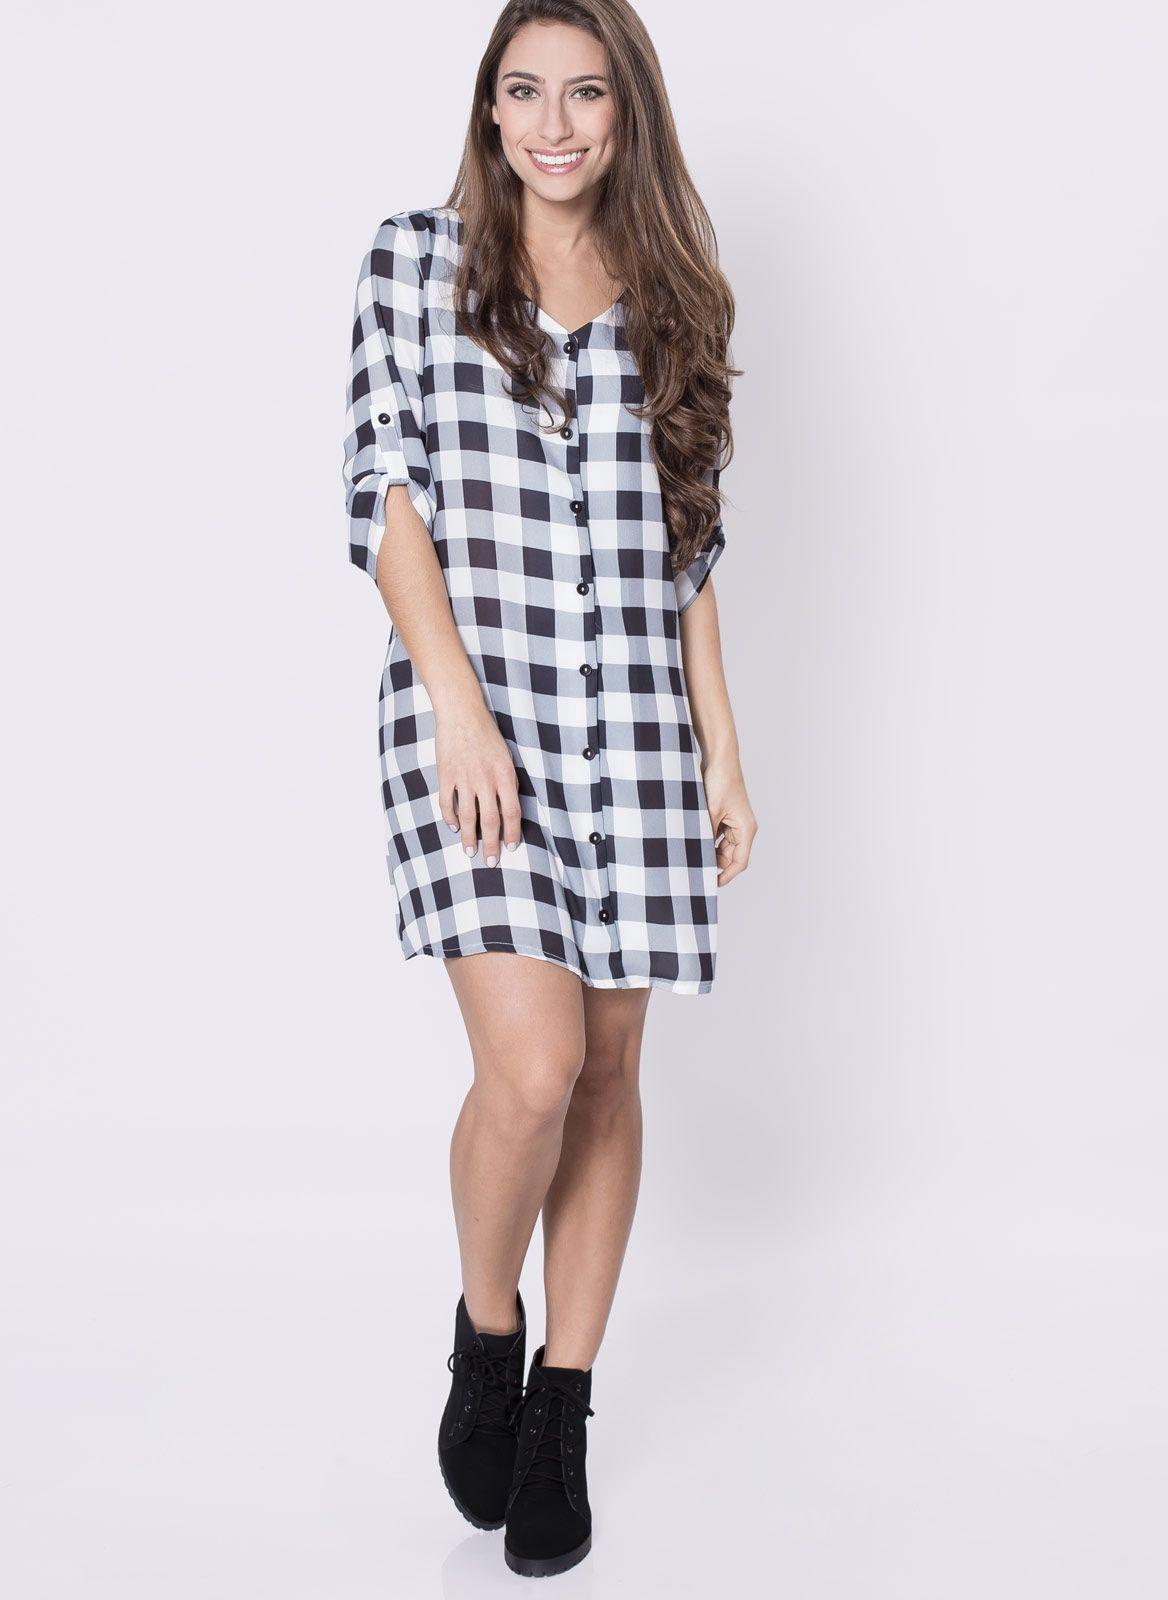 5d3f206a44dd Vestido Chemise Xadrez | P/ MAINHA - COSTURA | Vestido chemise ...